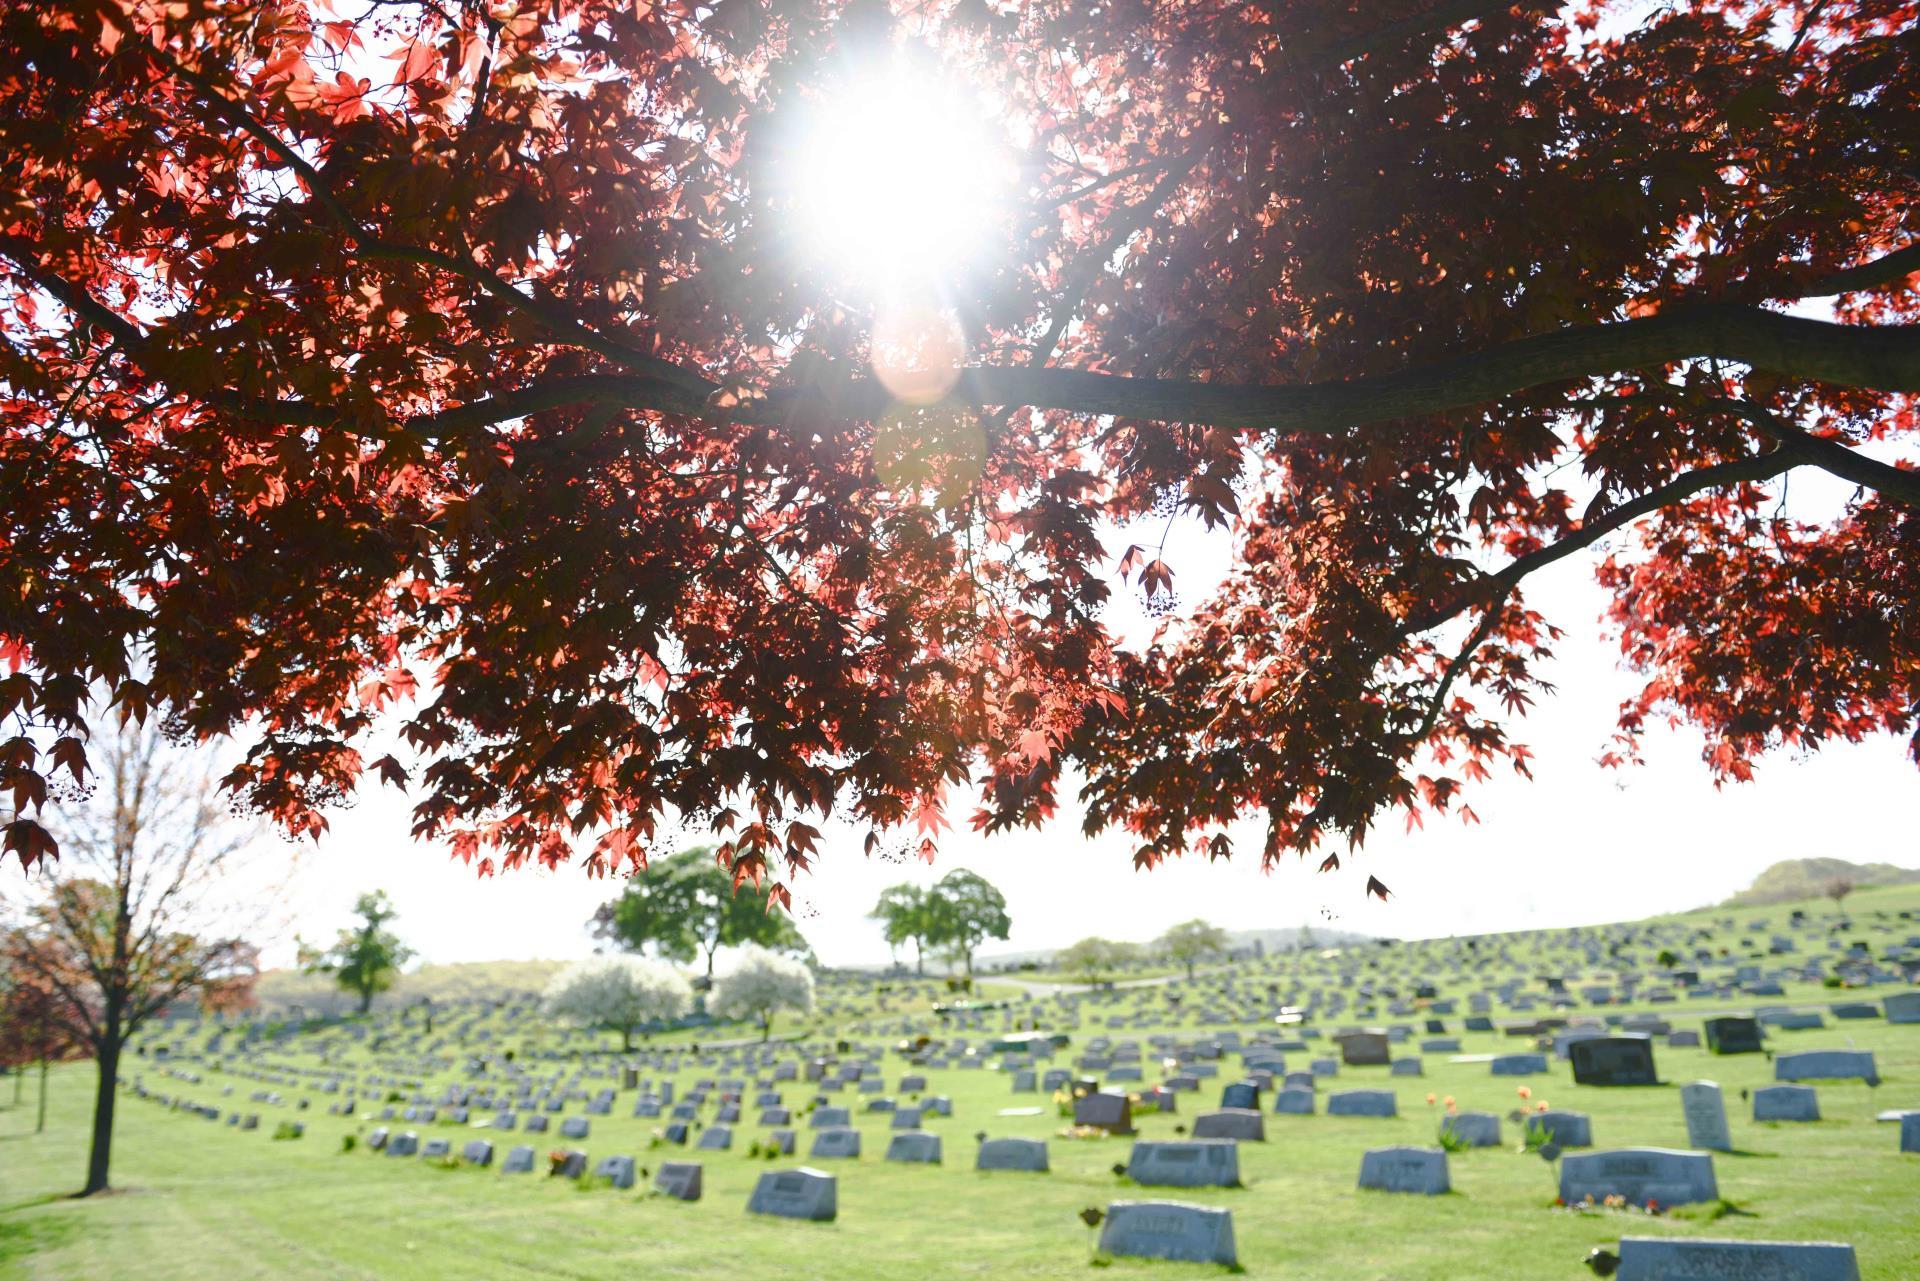 Japanese Maple tree at Gethsemane Cemetery